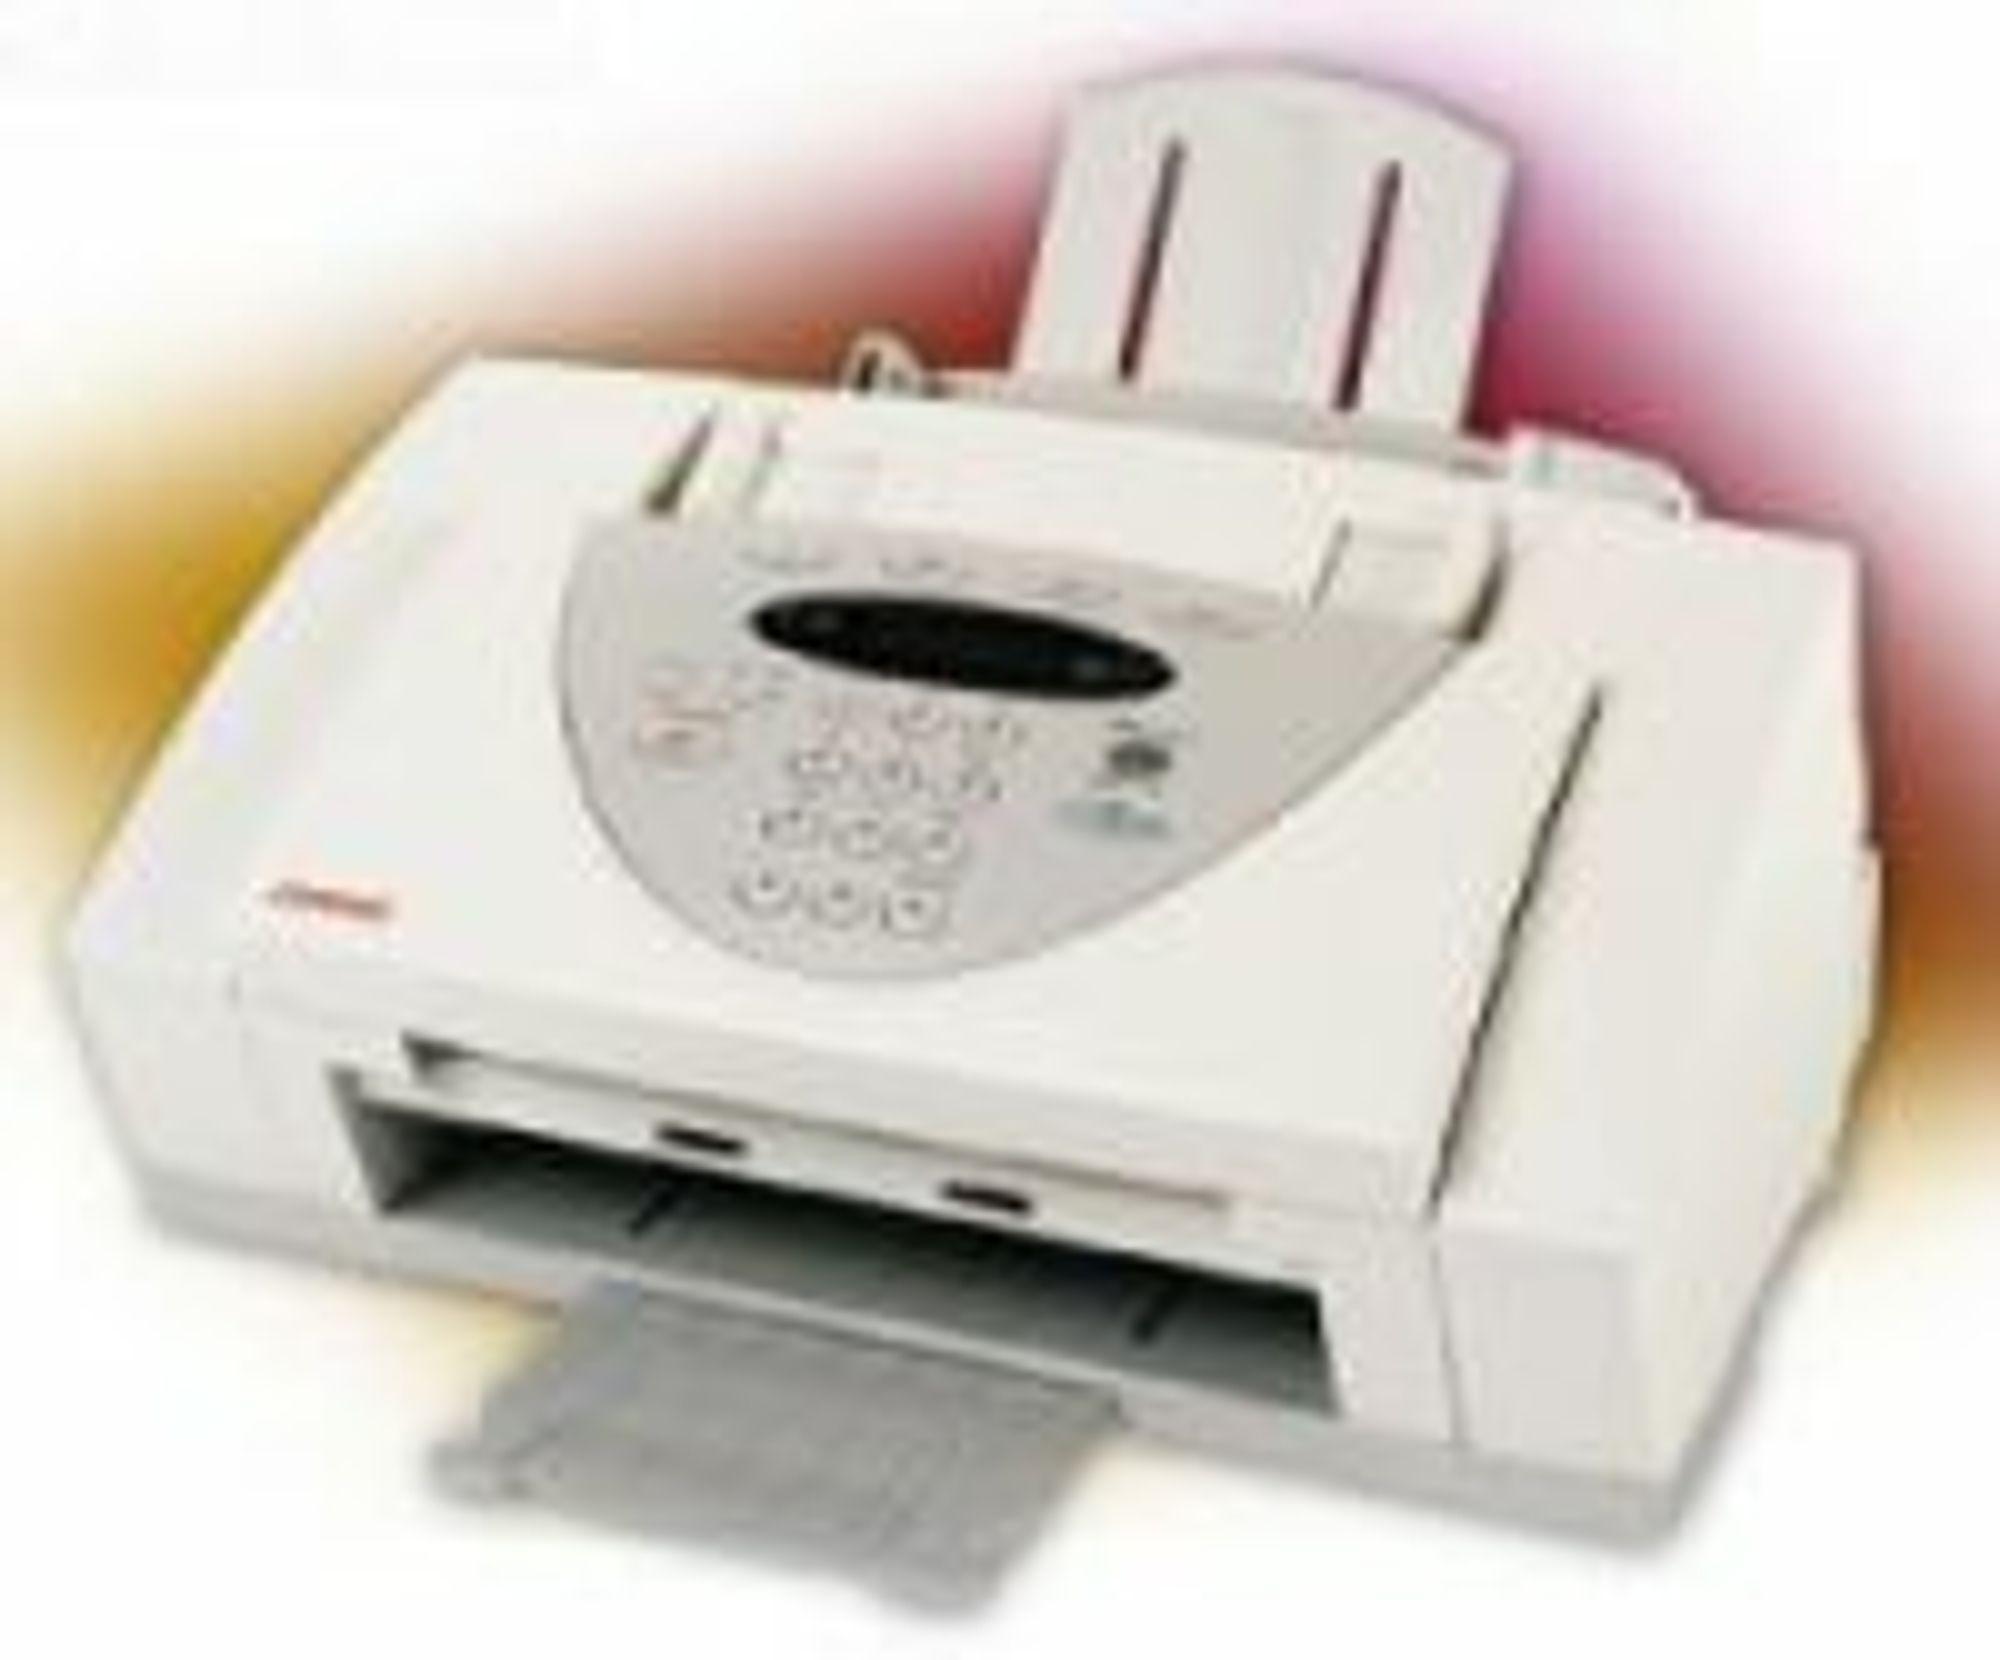 Multifunksjonsskriveren Compaq A900